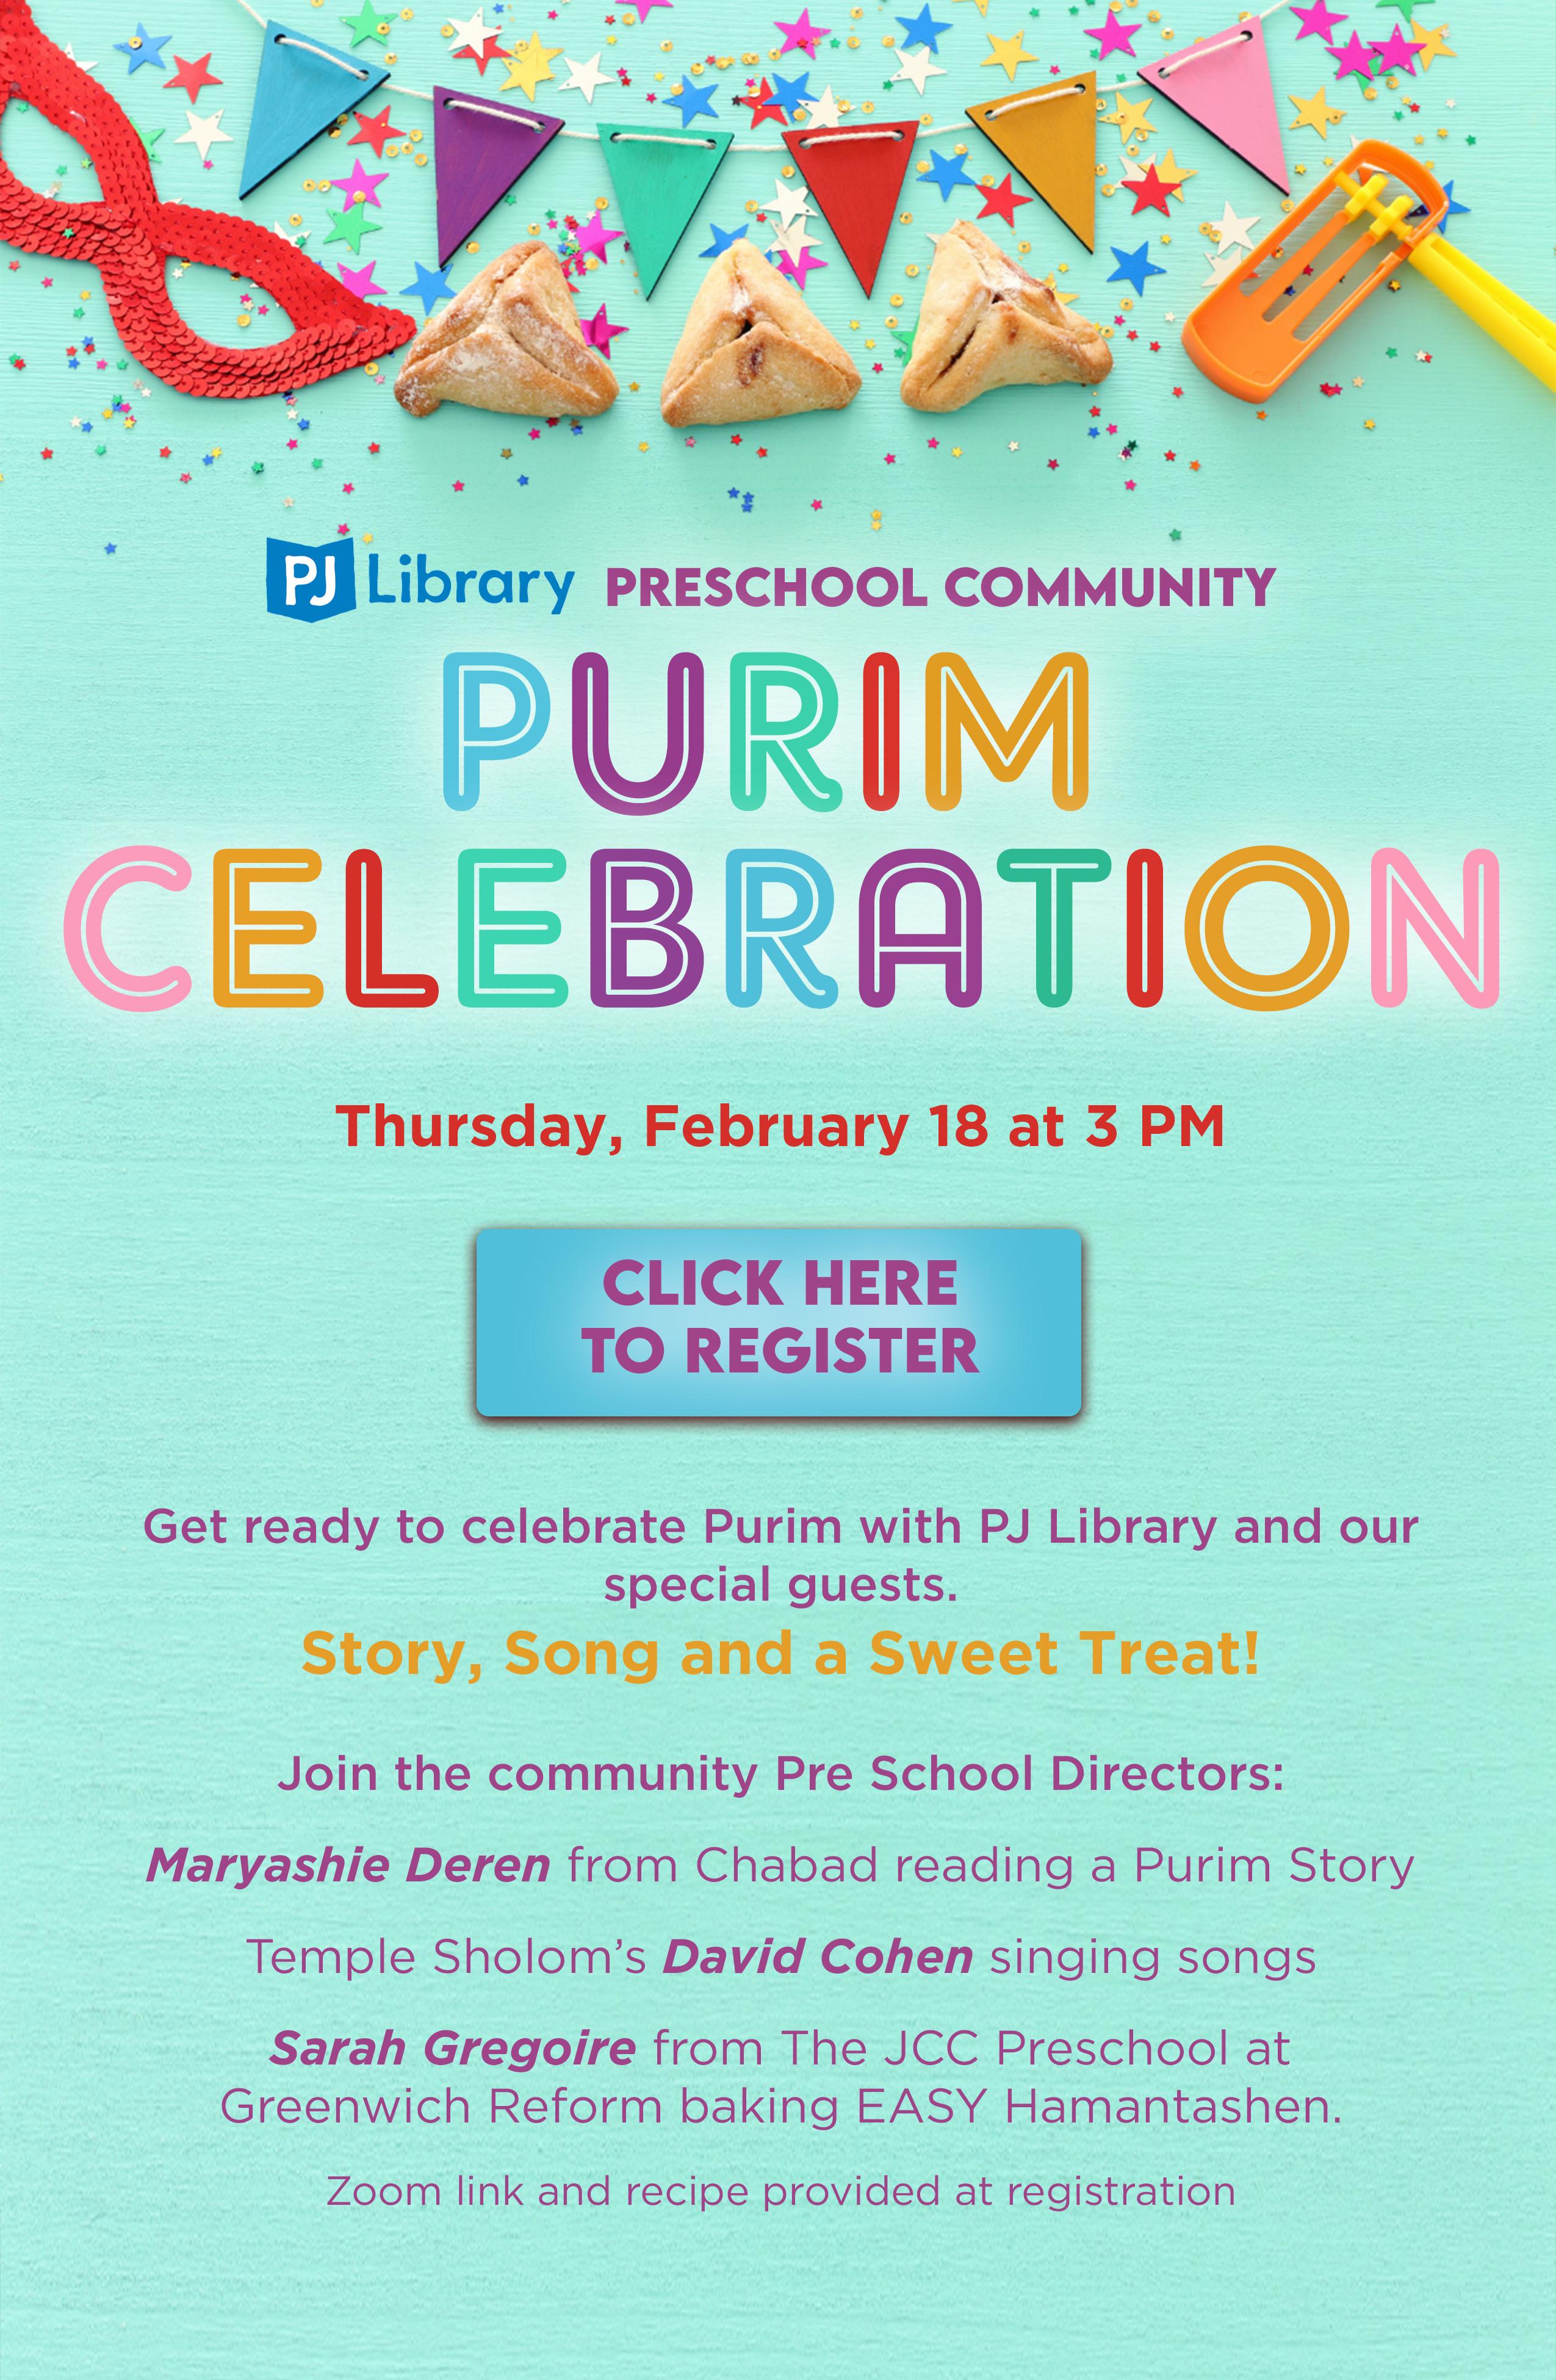 Community Pre School Purim Celebration